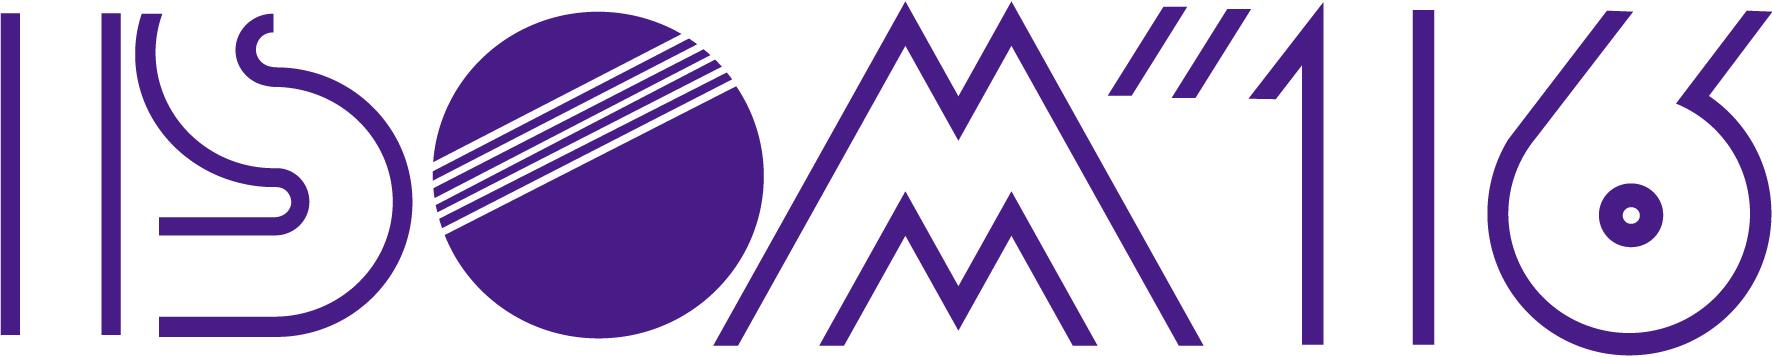 Isom16-logo